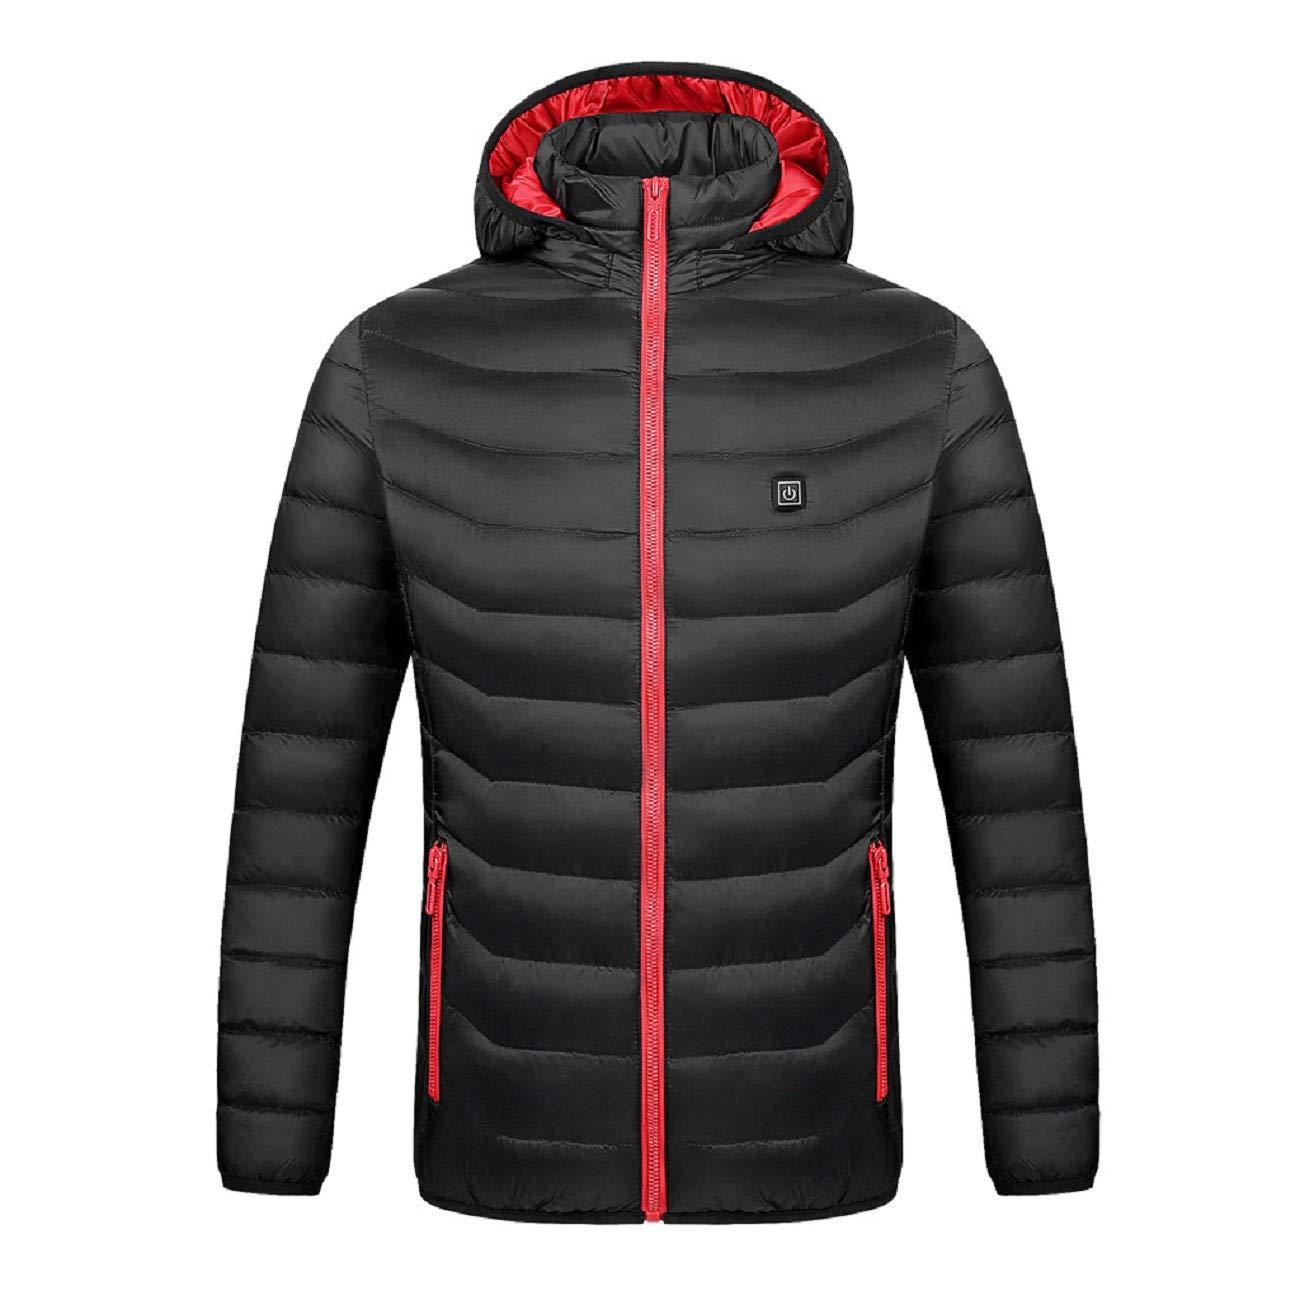 Reokoou Winer Warm Down Jacket Women Smart USB Abdominal Back Electric Heating Coat Long Sleeve Hoodie Cotton Outwear Black by Reokoou